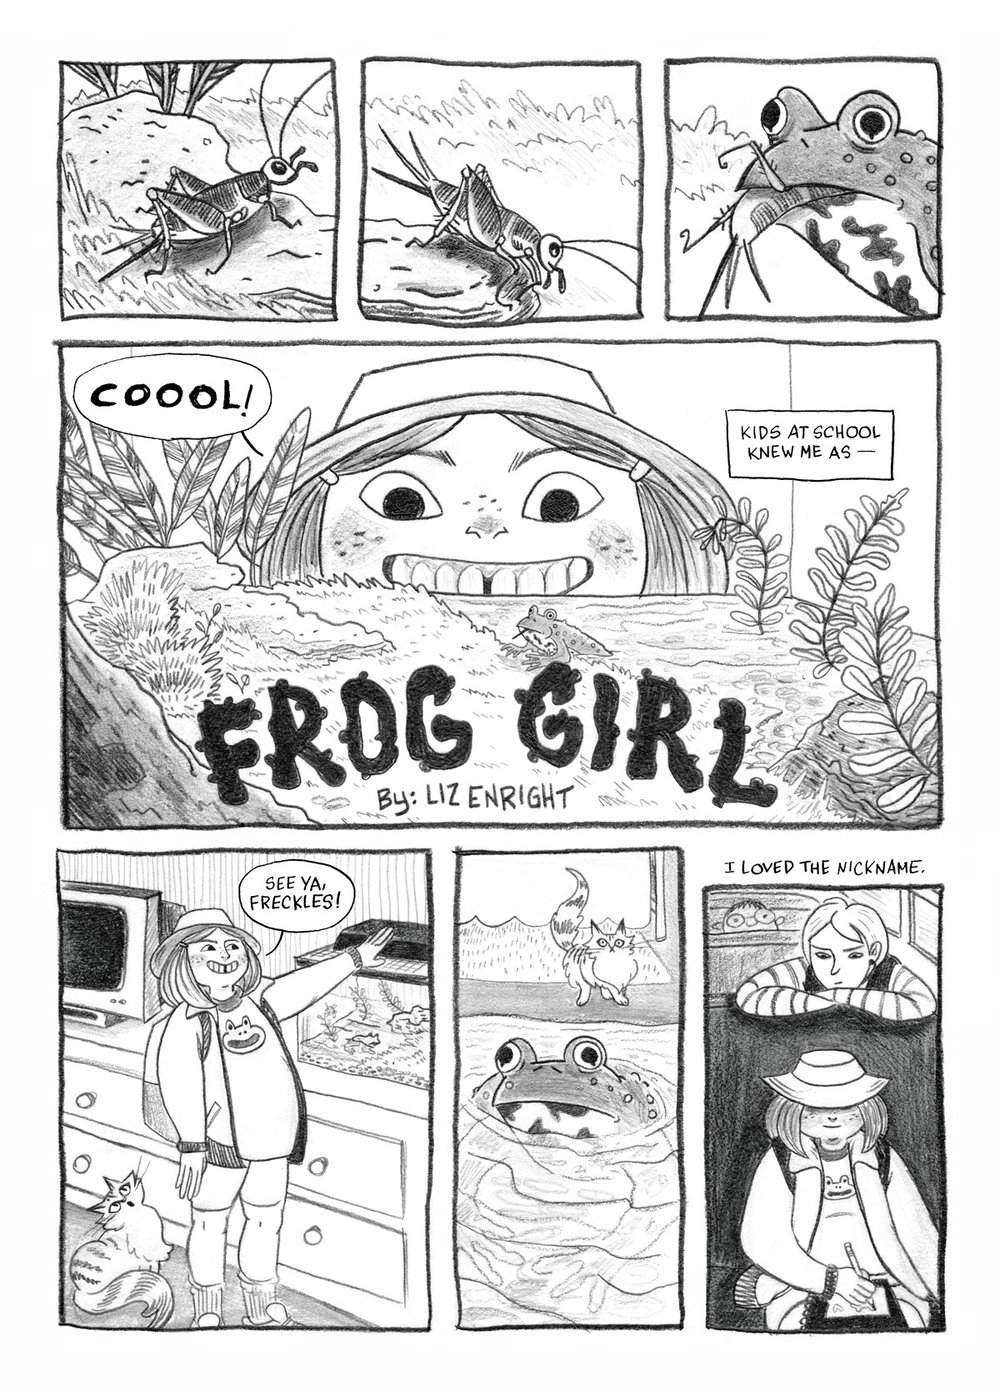 FrogGirl_squarespace_01.jpg